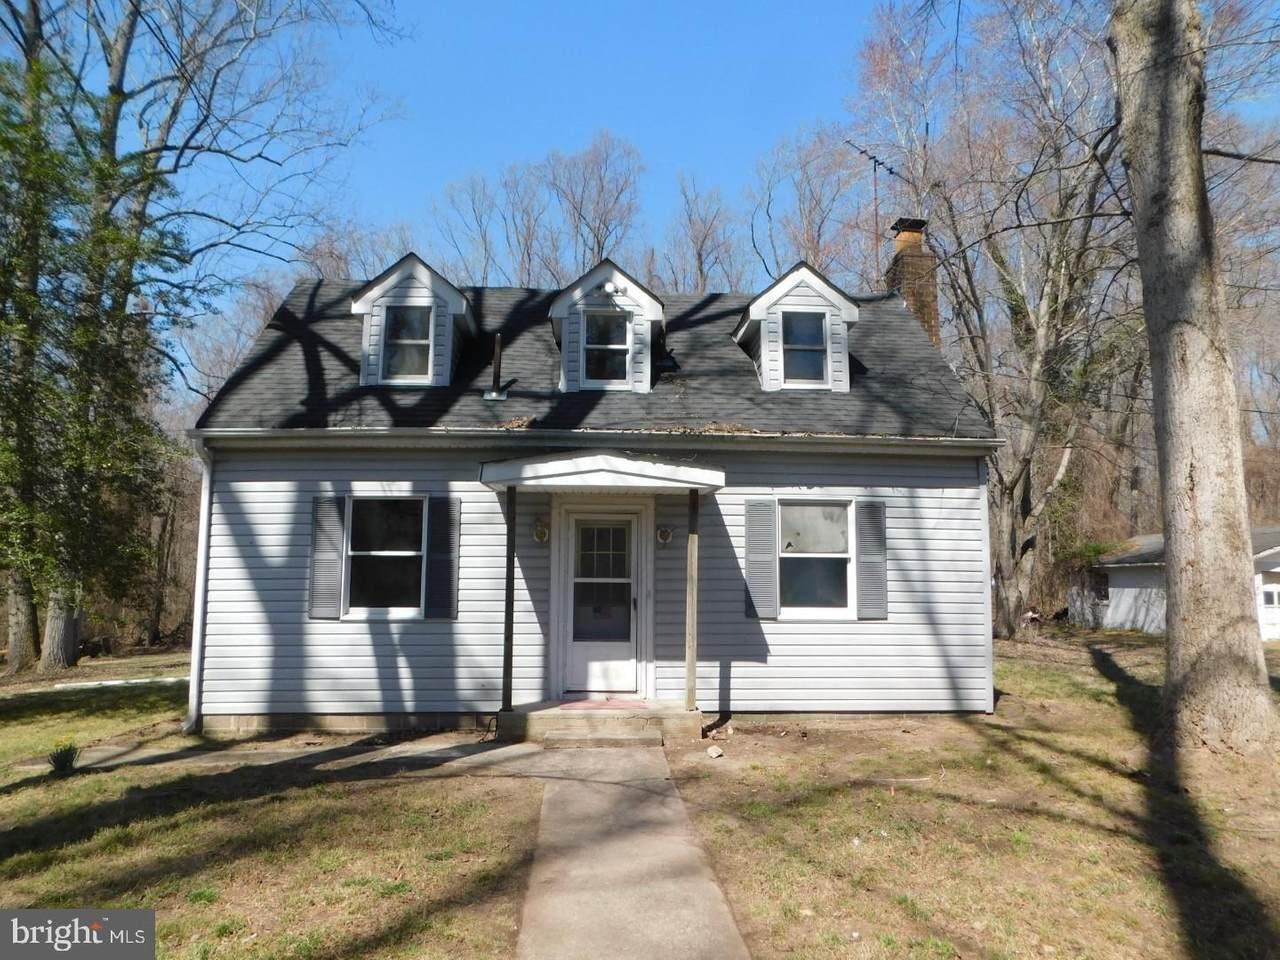 6500 Marion Adams Place - Photo 1